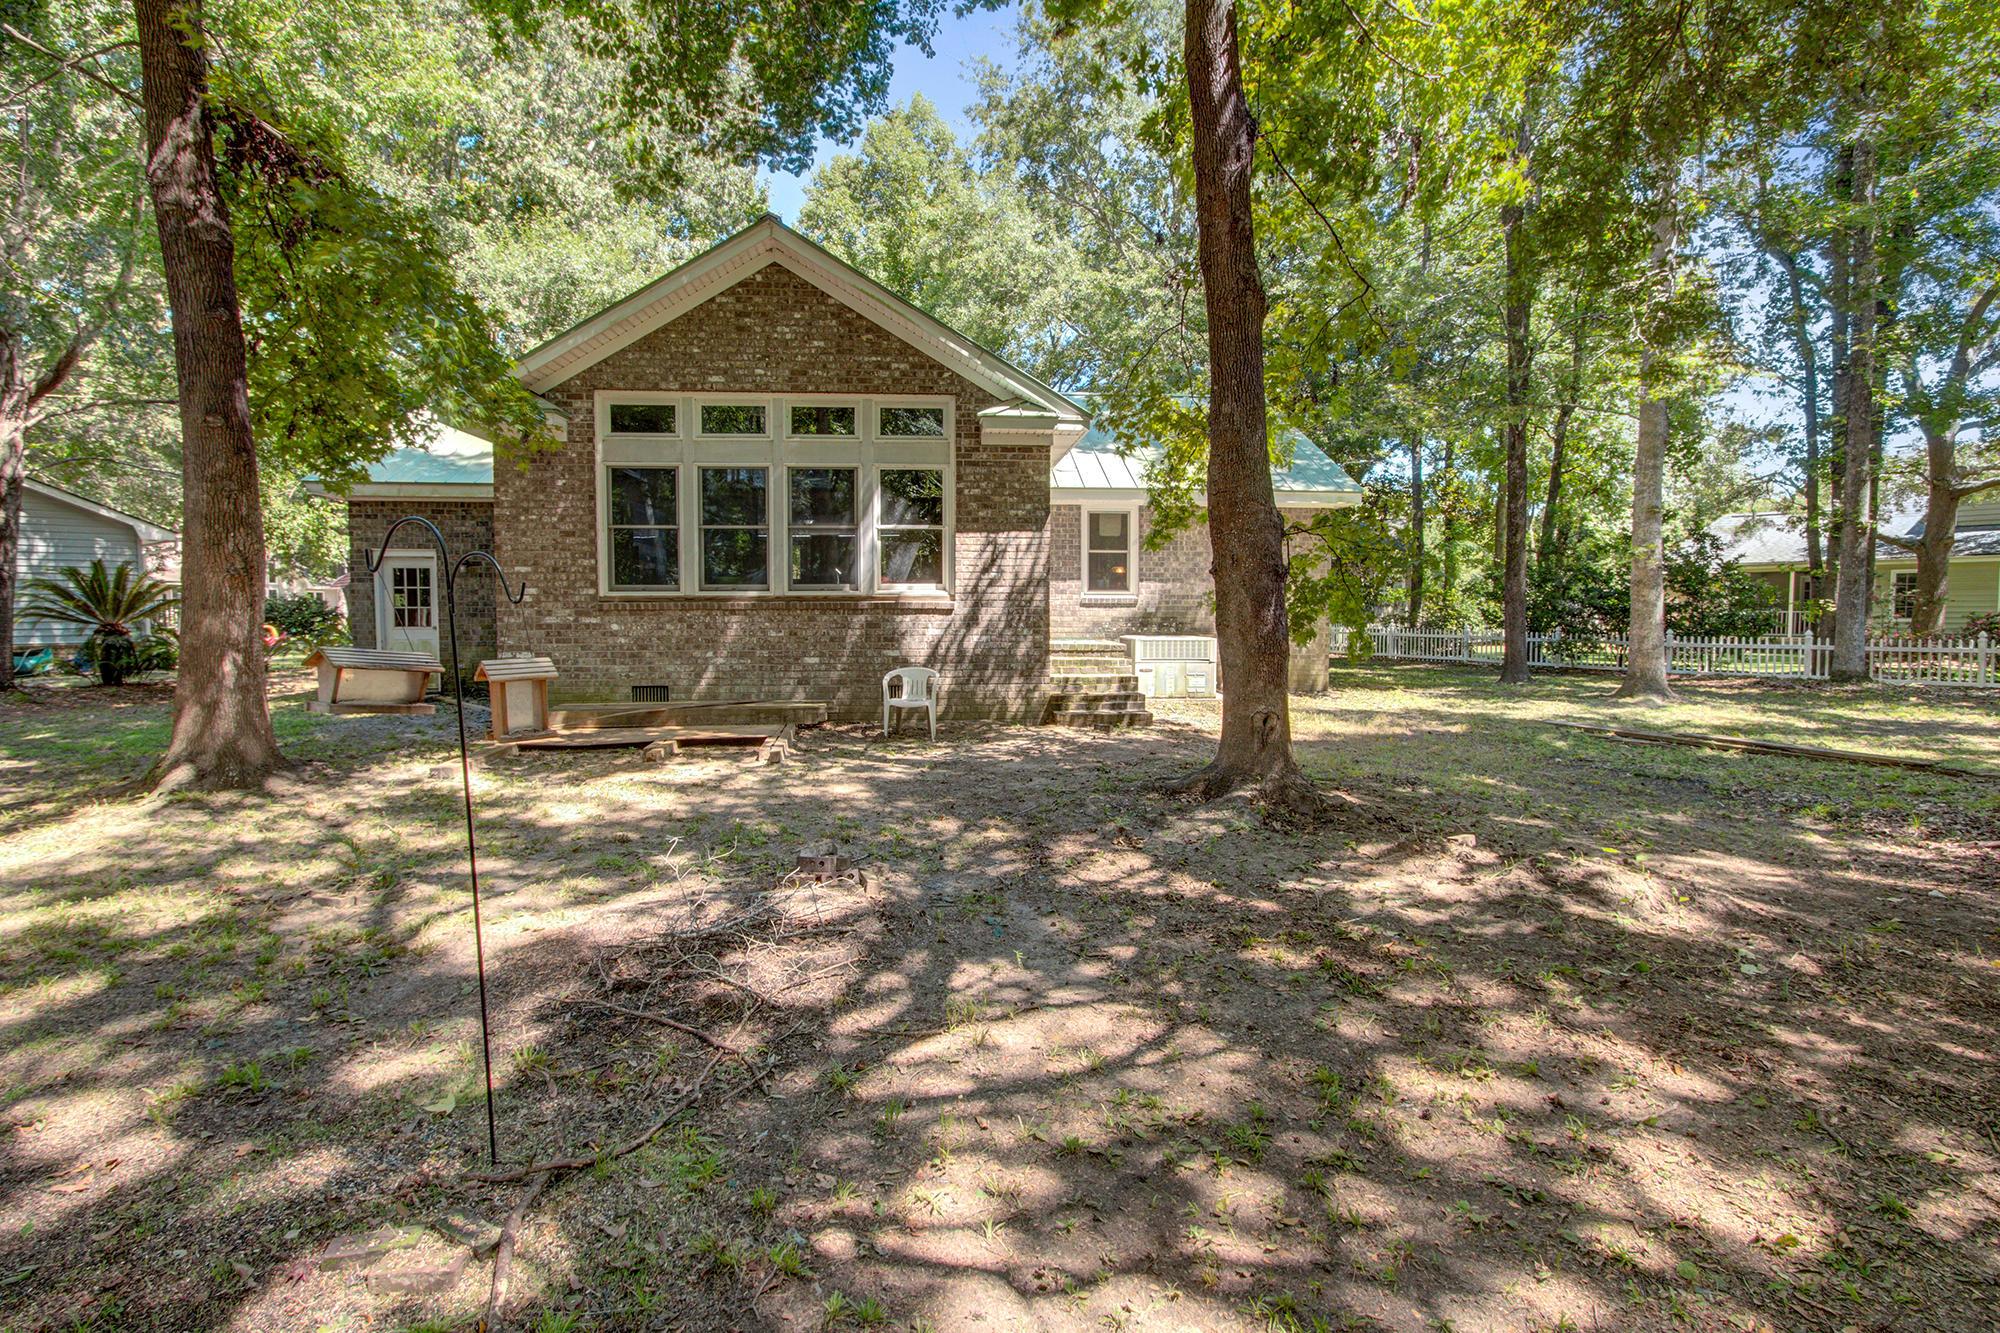 Wando Lakes Homes For Sale - 858 Fairlawn, Mount Pleasant, SC - 8